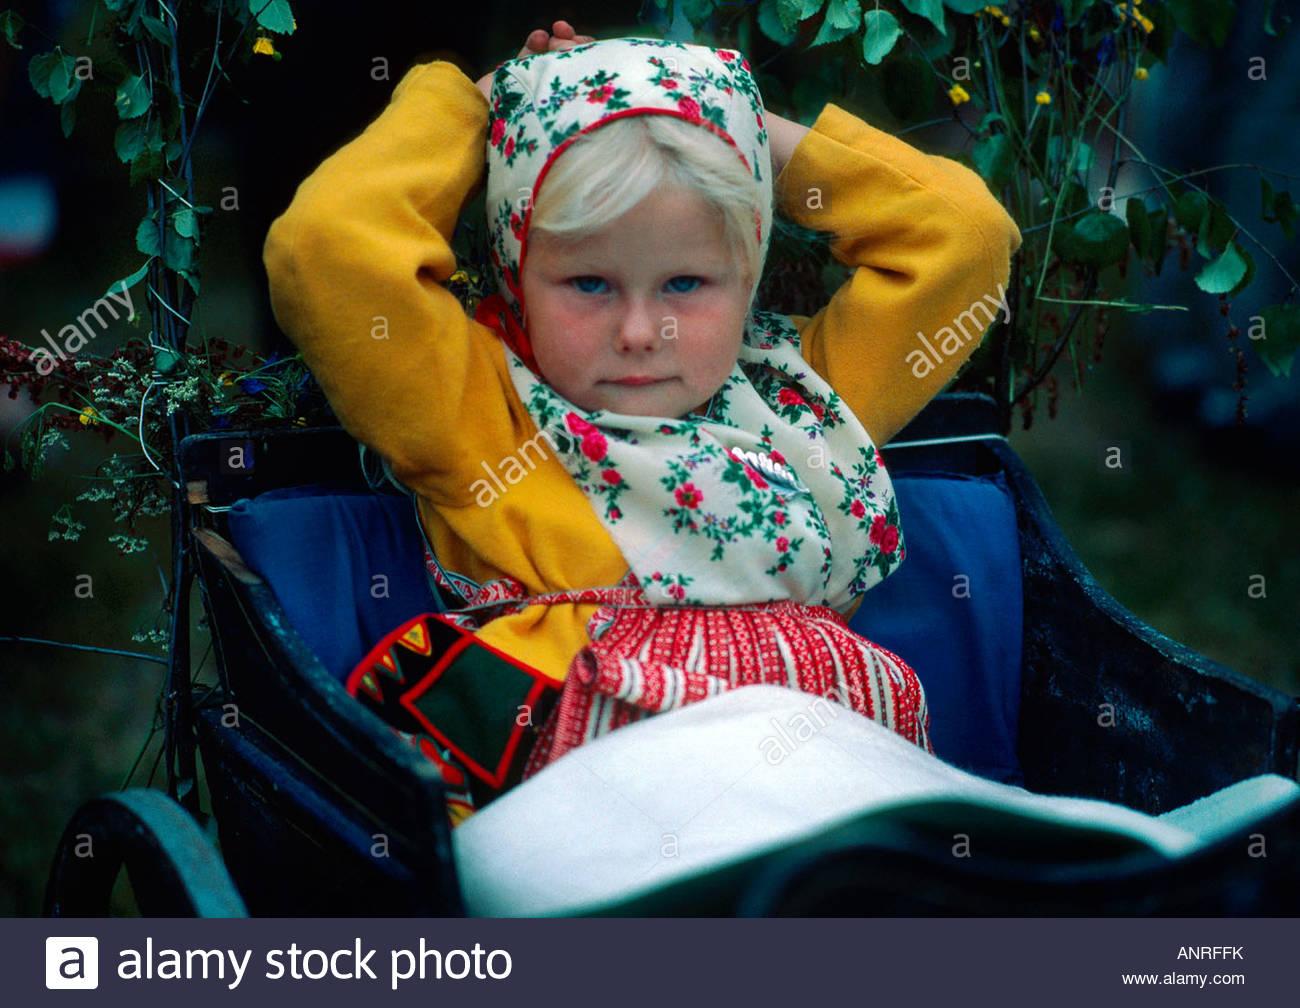 Young Swedish girl at the maypole raising during the Midsummer celebration Siljansnas Dalarna Province Sweden - Stock Image